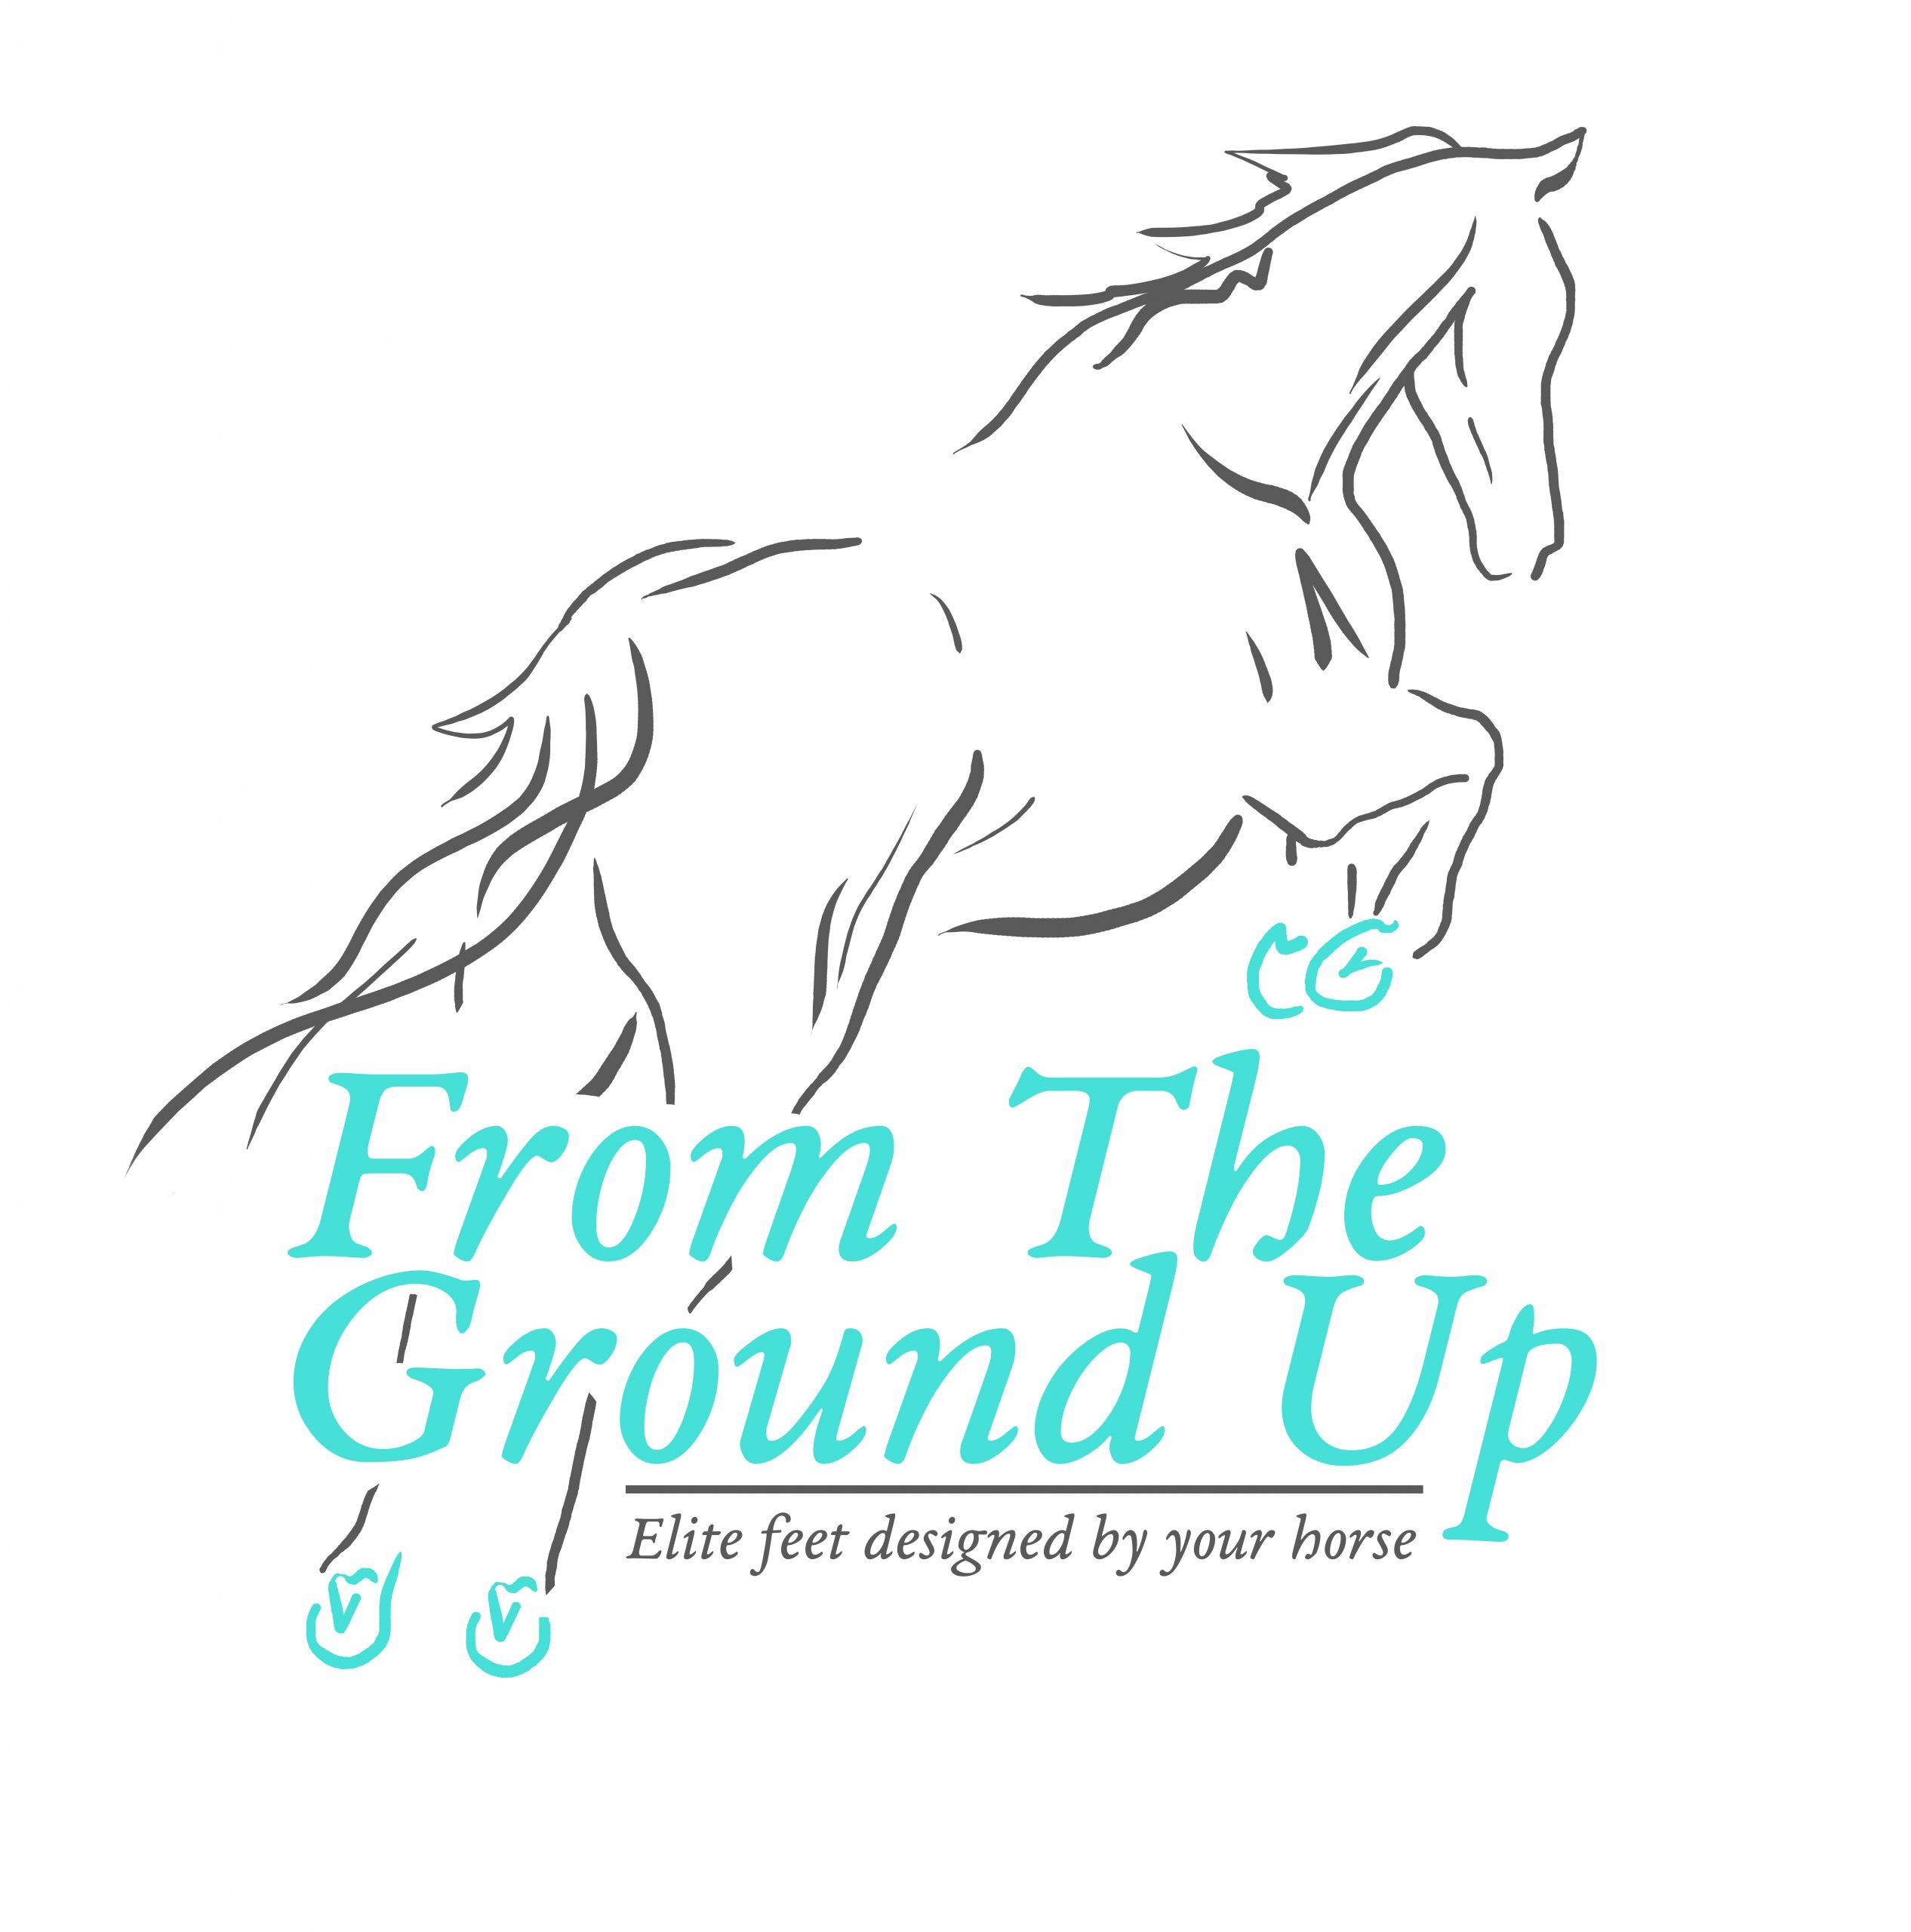 FTGUp logo